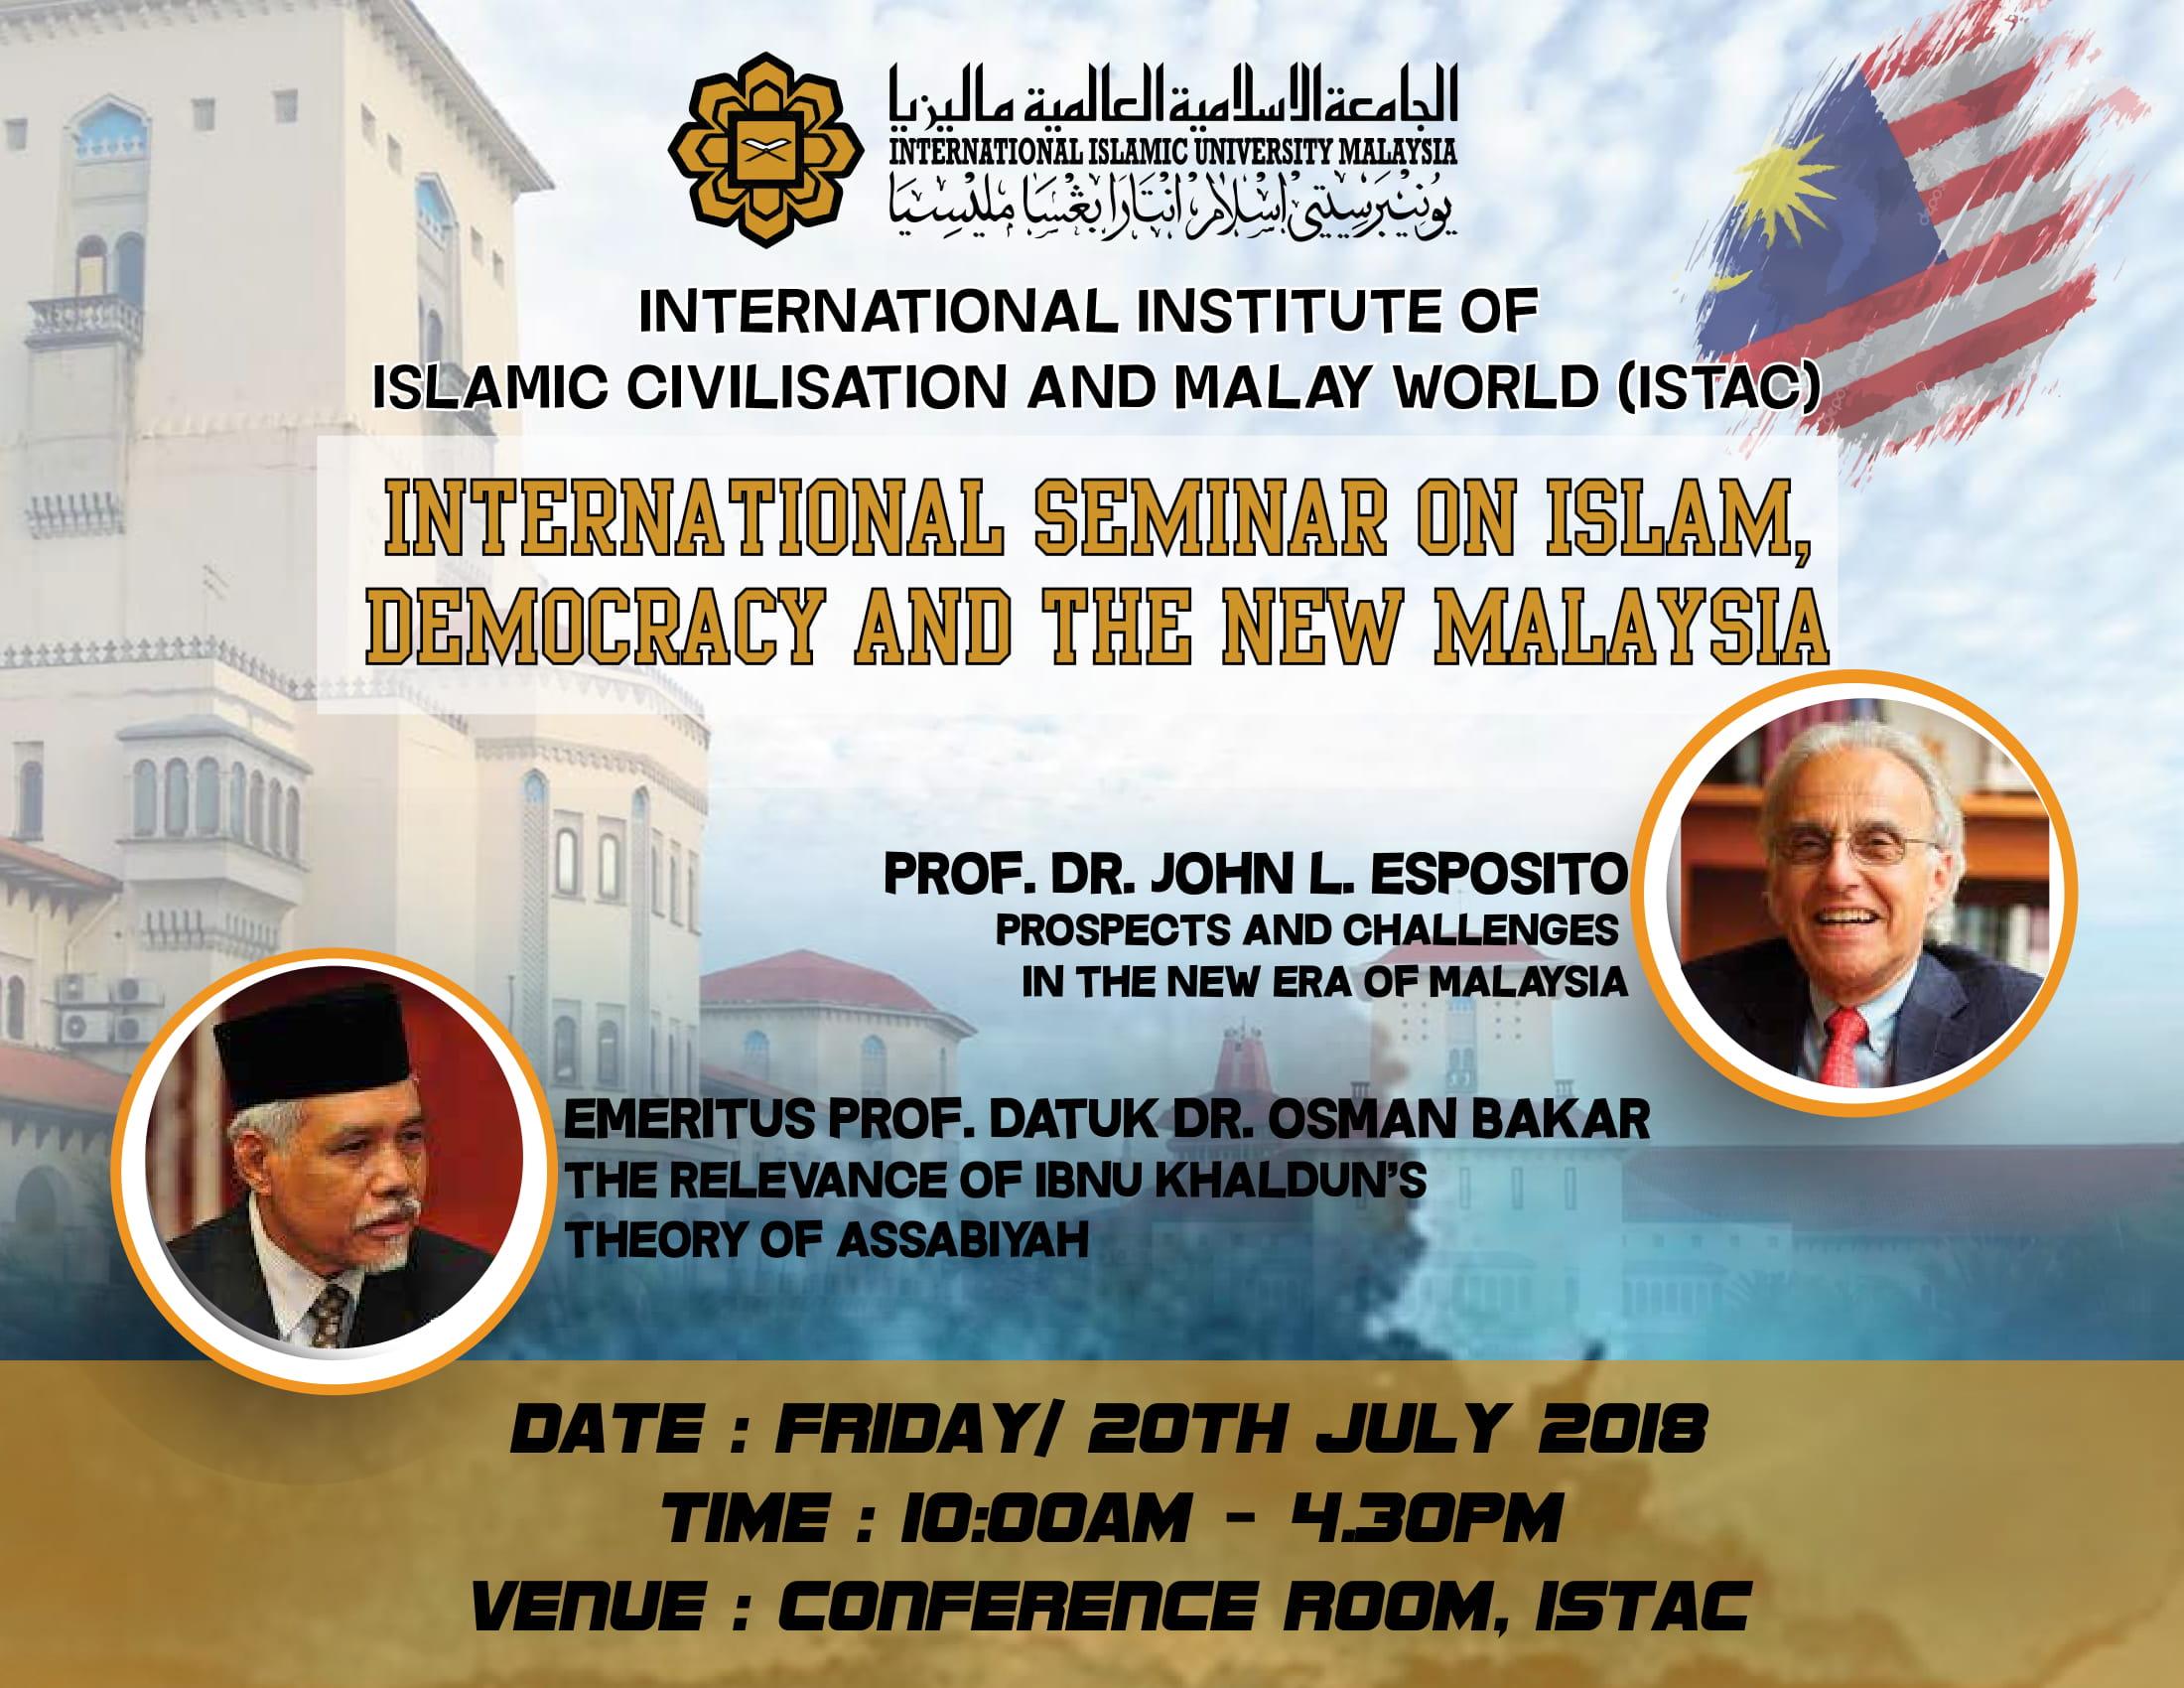 International Seminar on Islam, Democracy and the new Malaysia